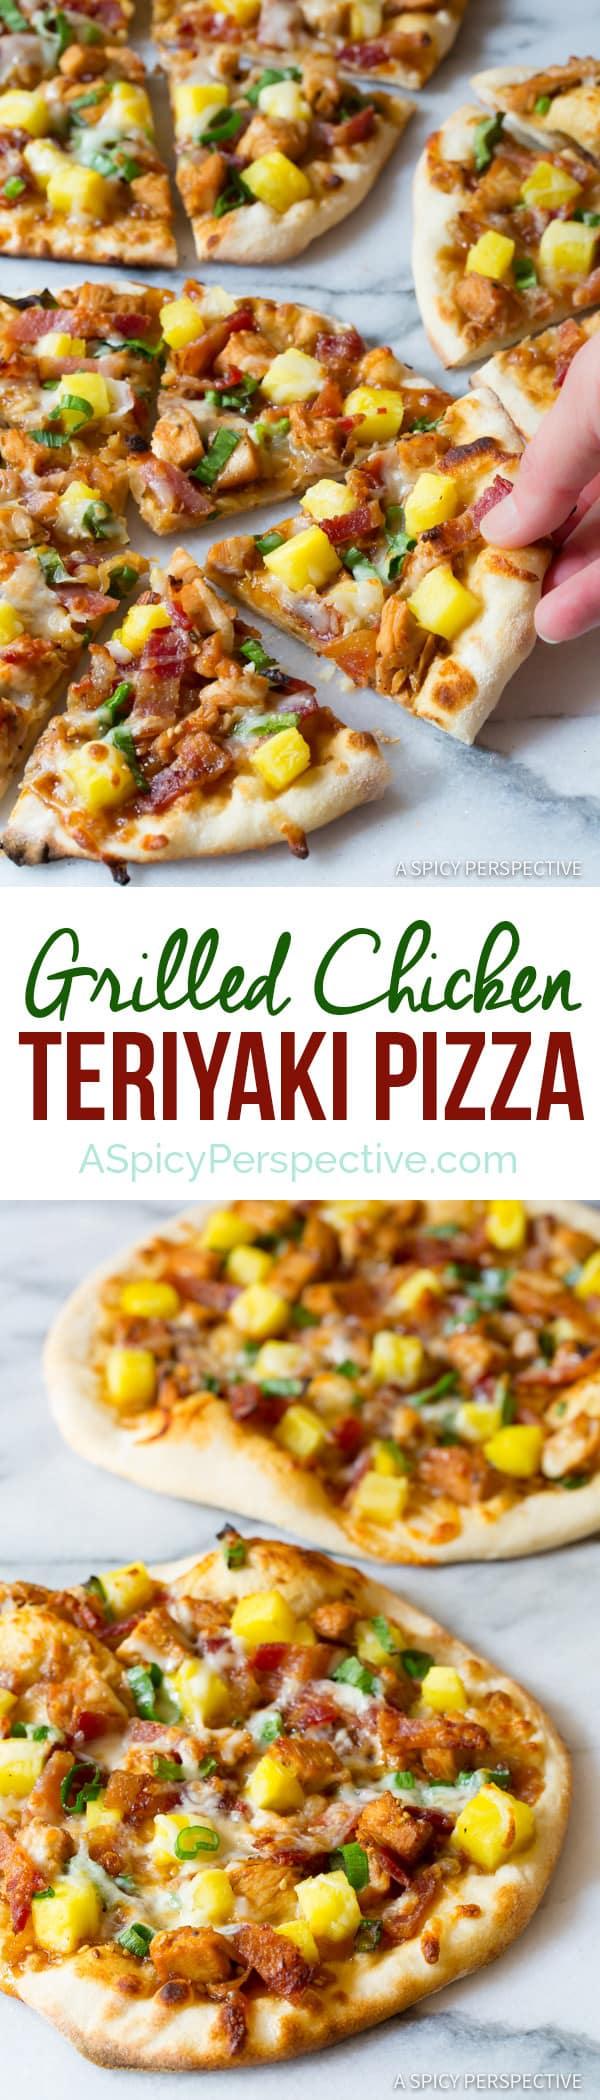 Easy Grilled Chicken Teriyaki Pizza | ASpicyPerspective.com